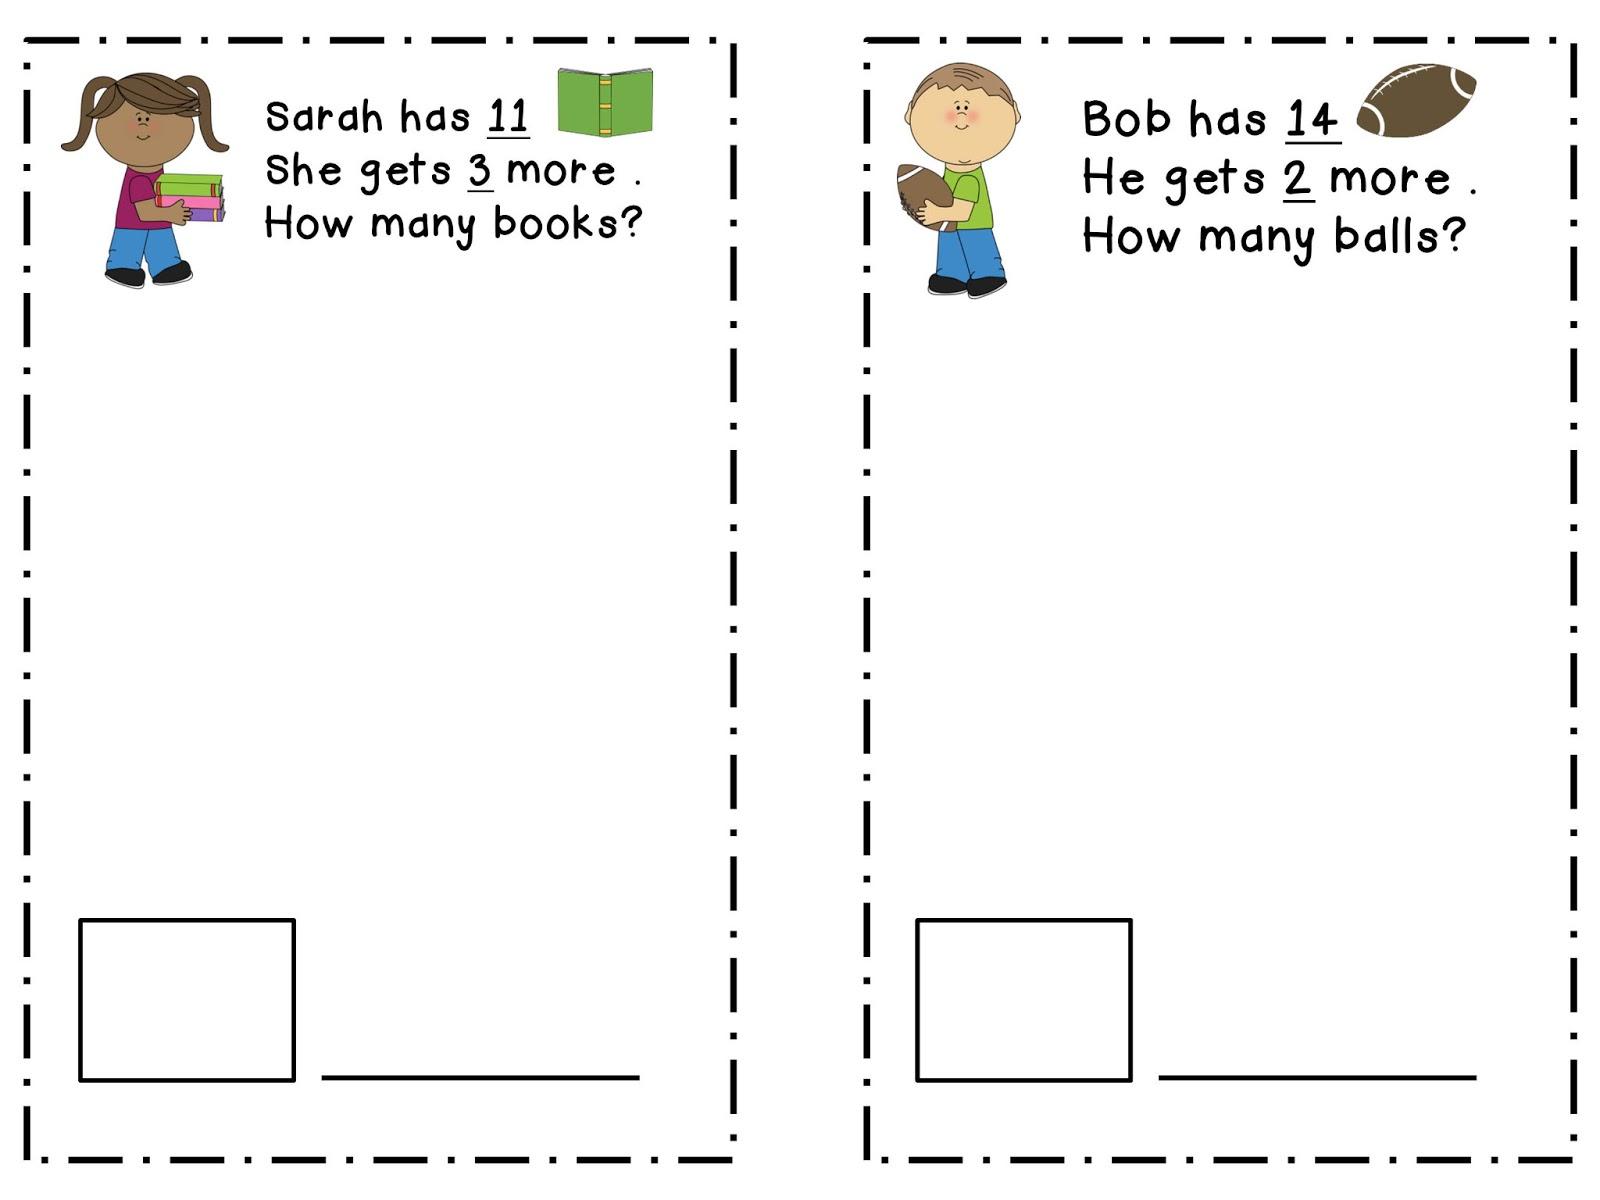 math problems for kids | Kids